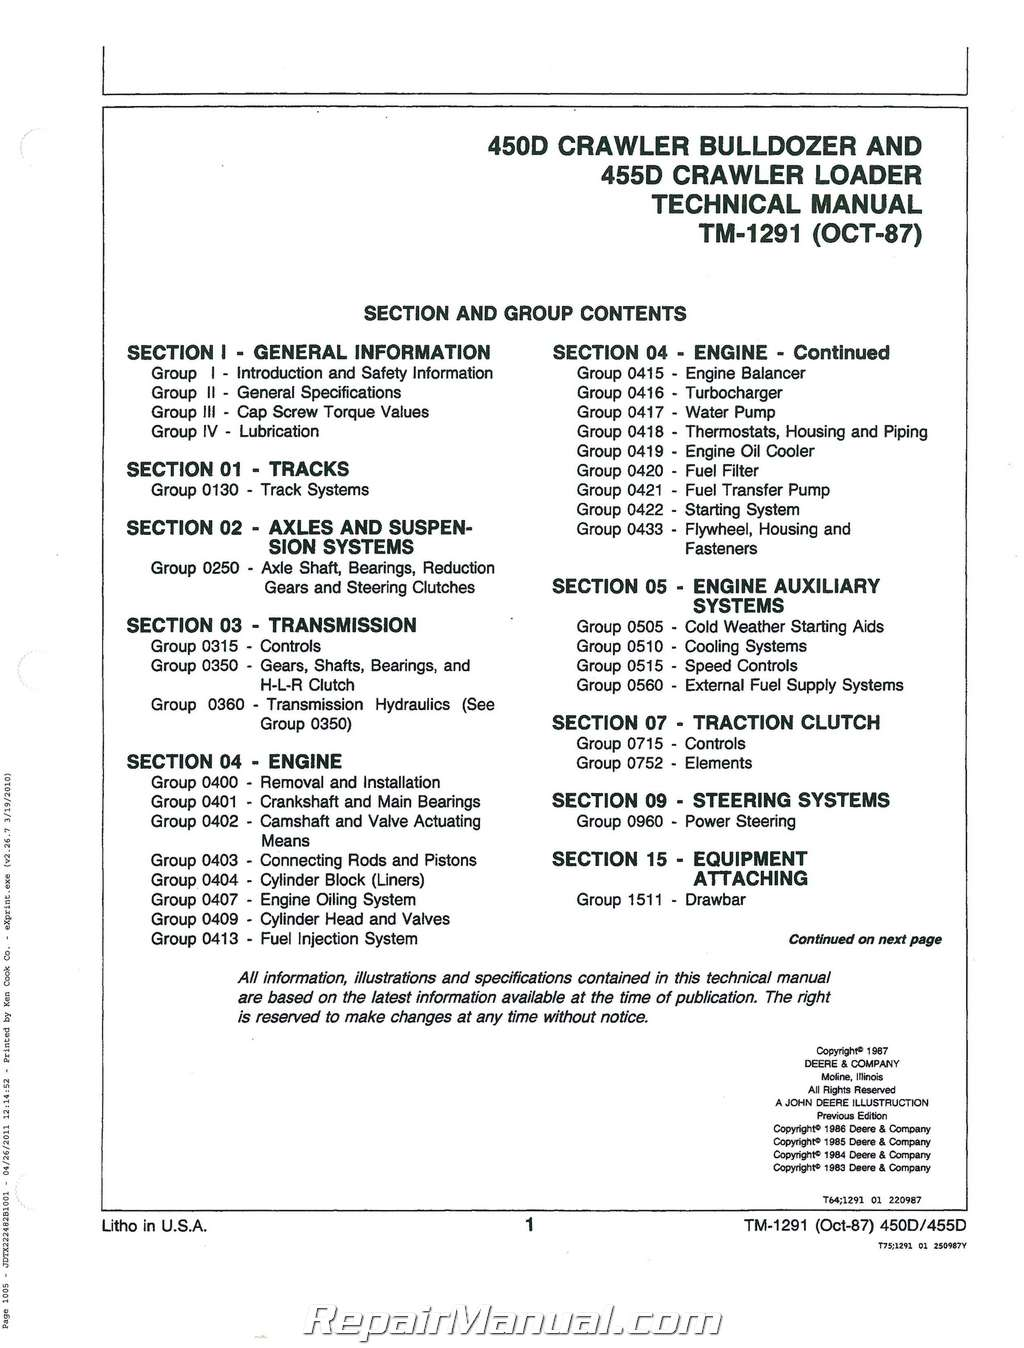 John Deere 450d 455d Service Manual